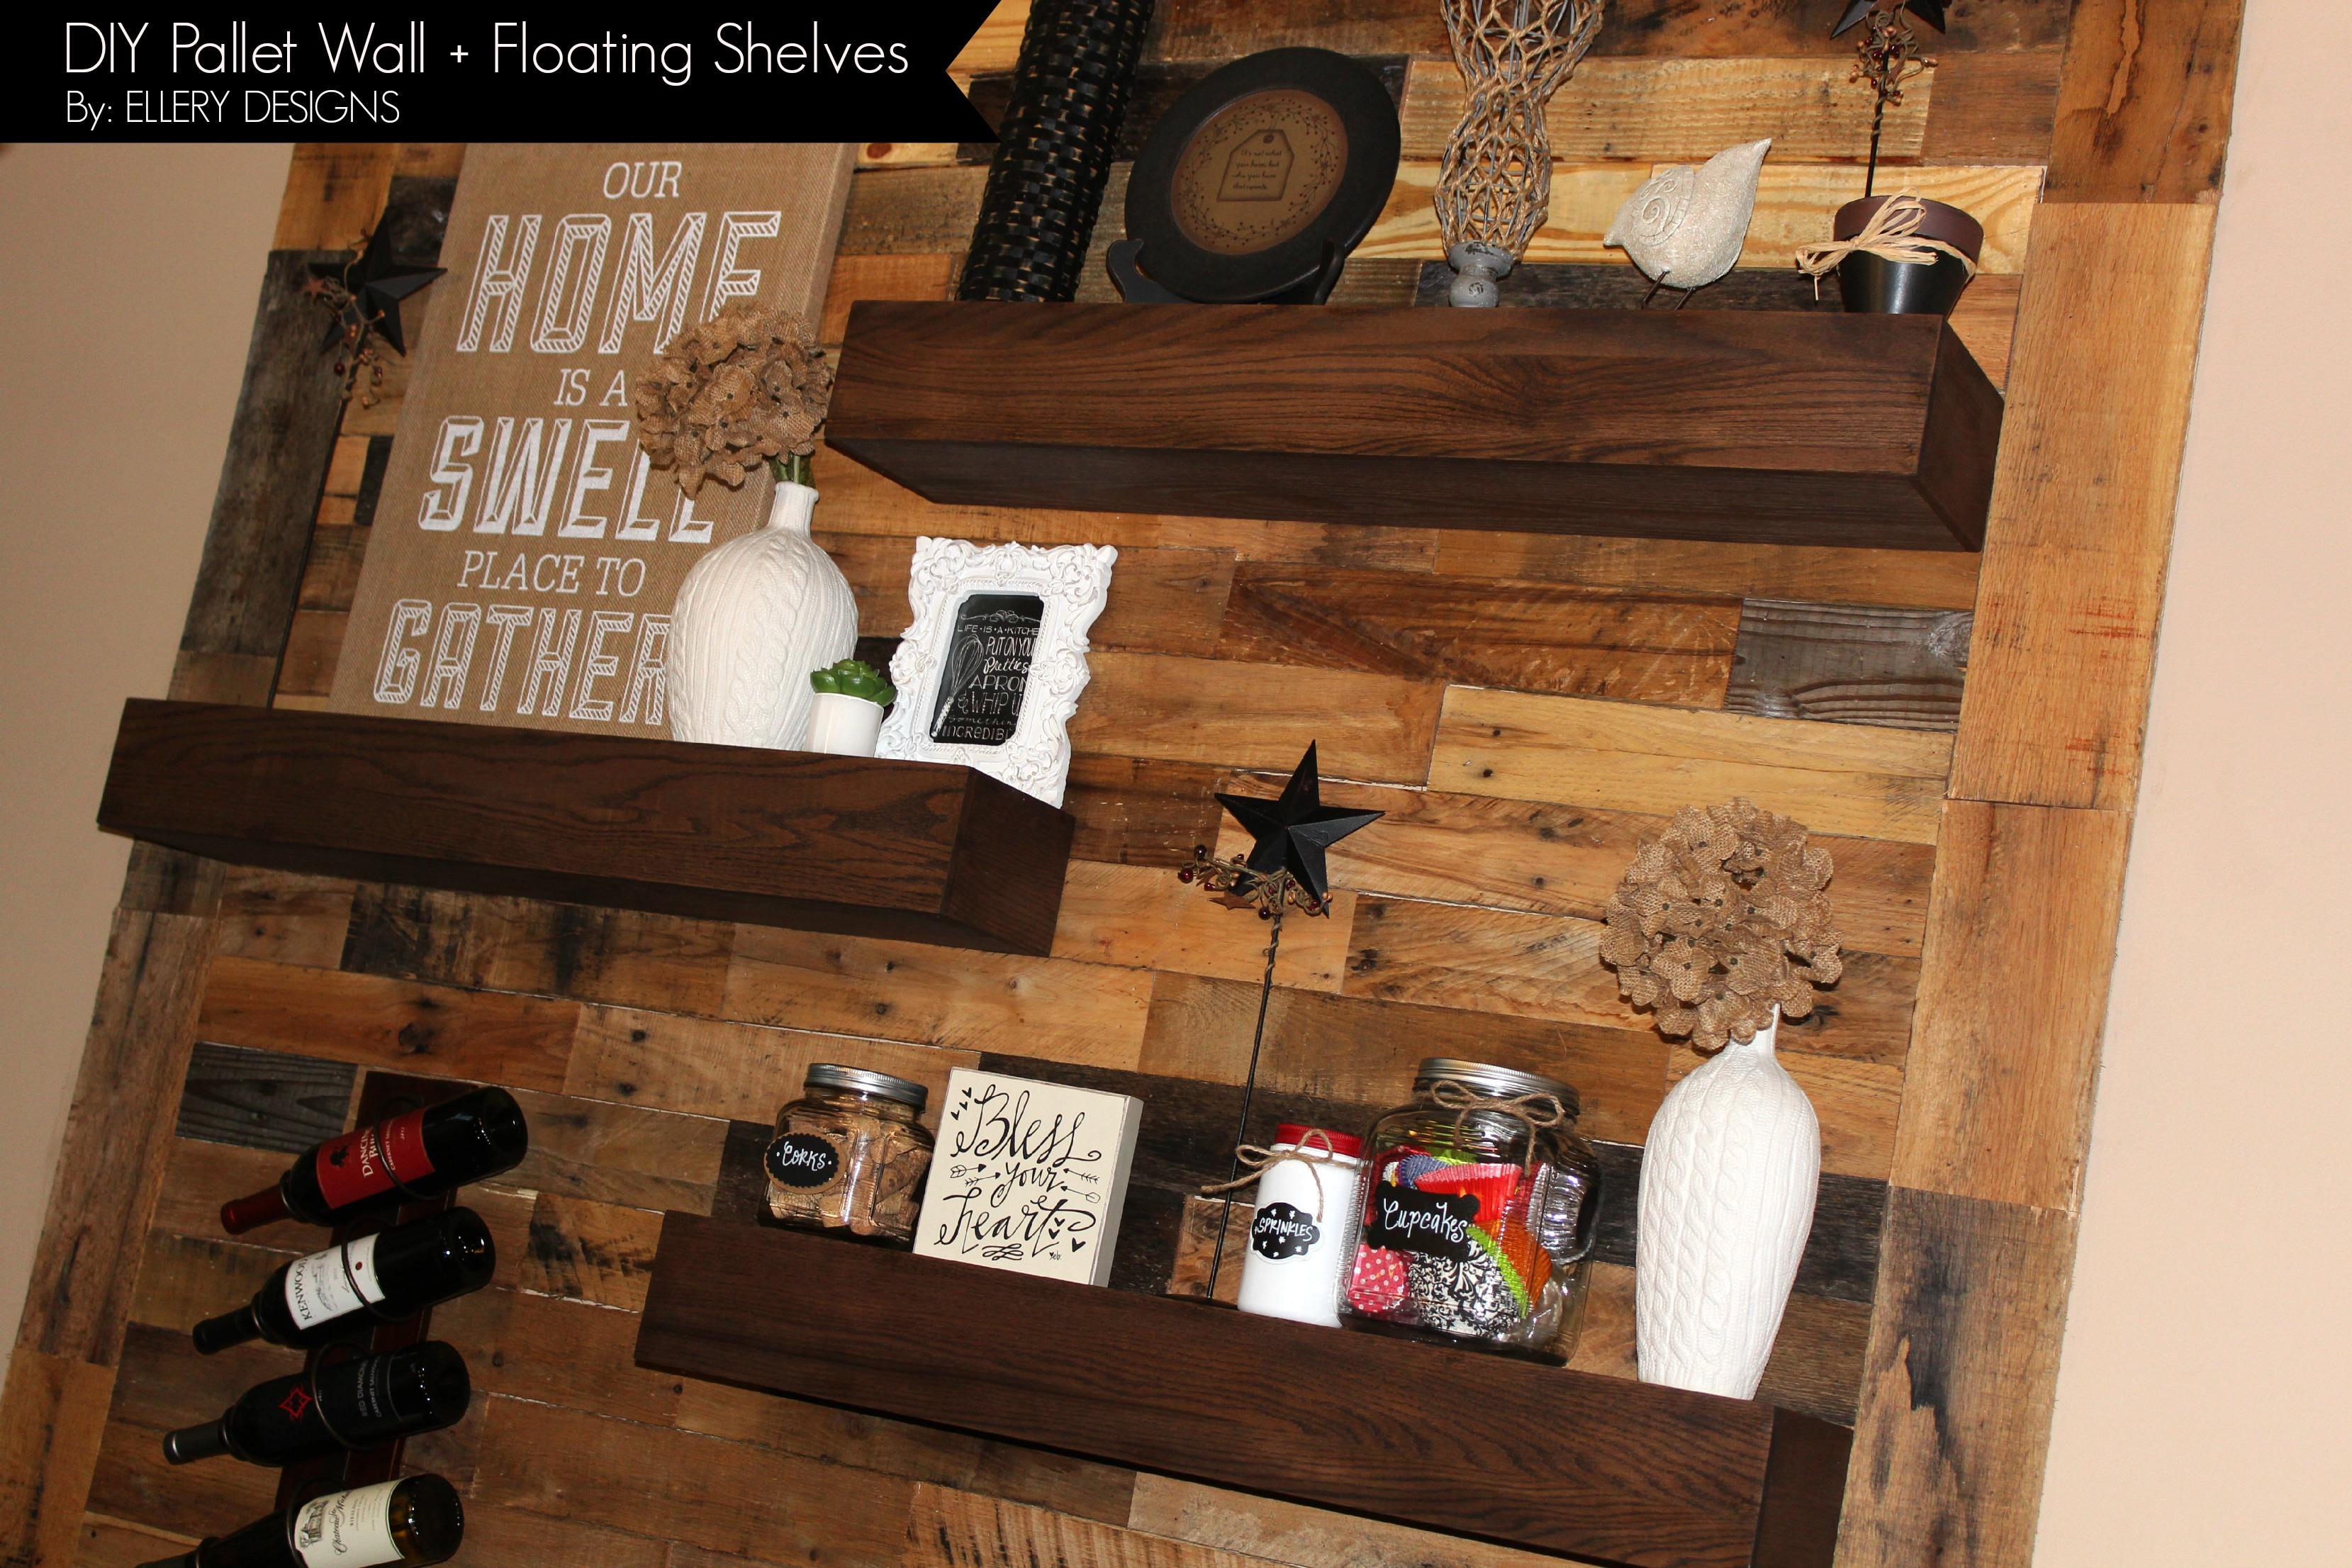 Dining room remodel pallet wall floating shelves for Making storage shelves out of pallets